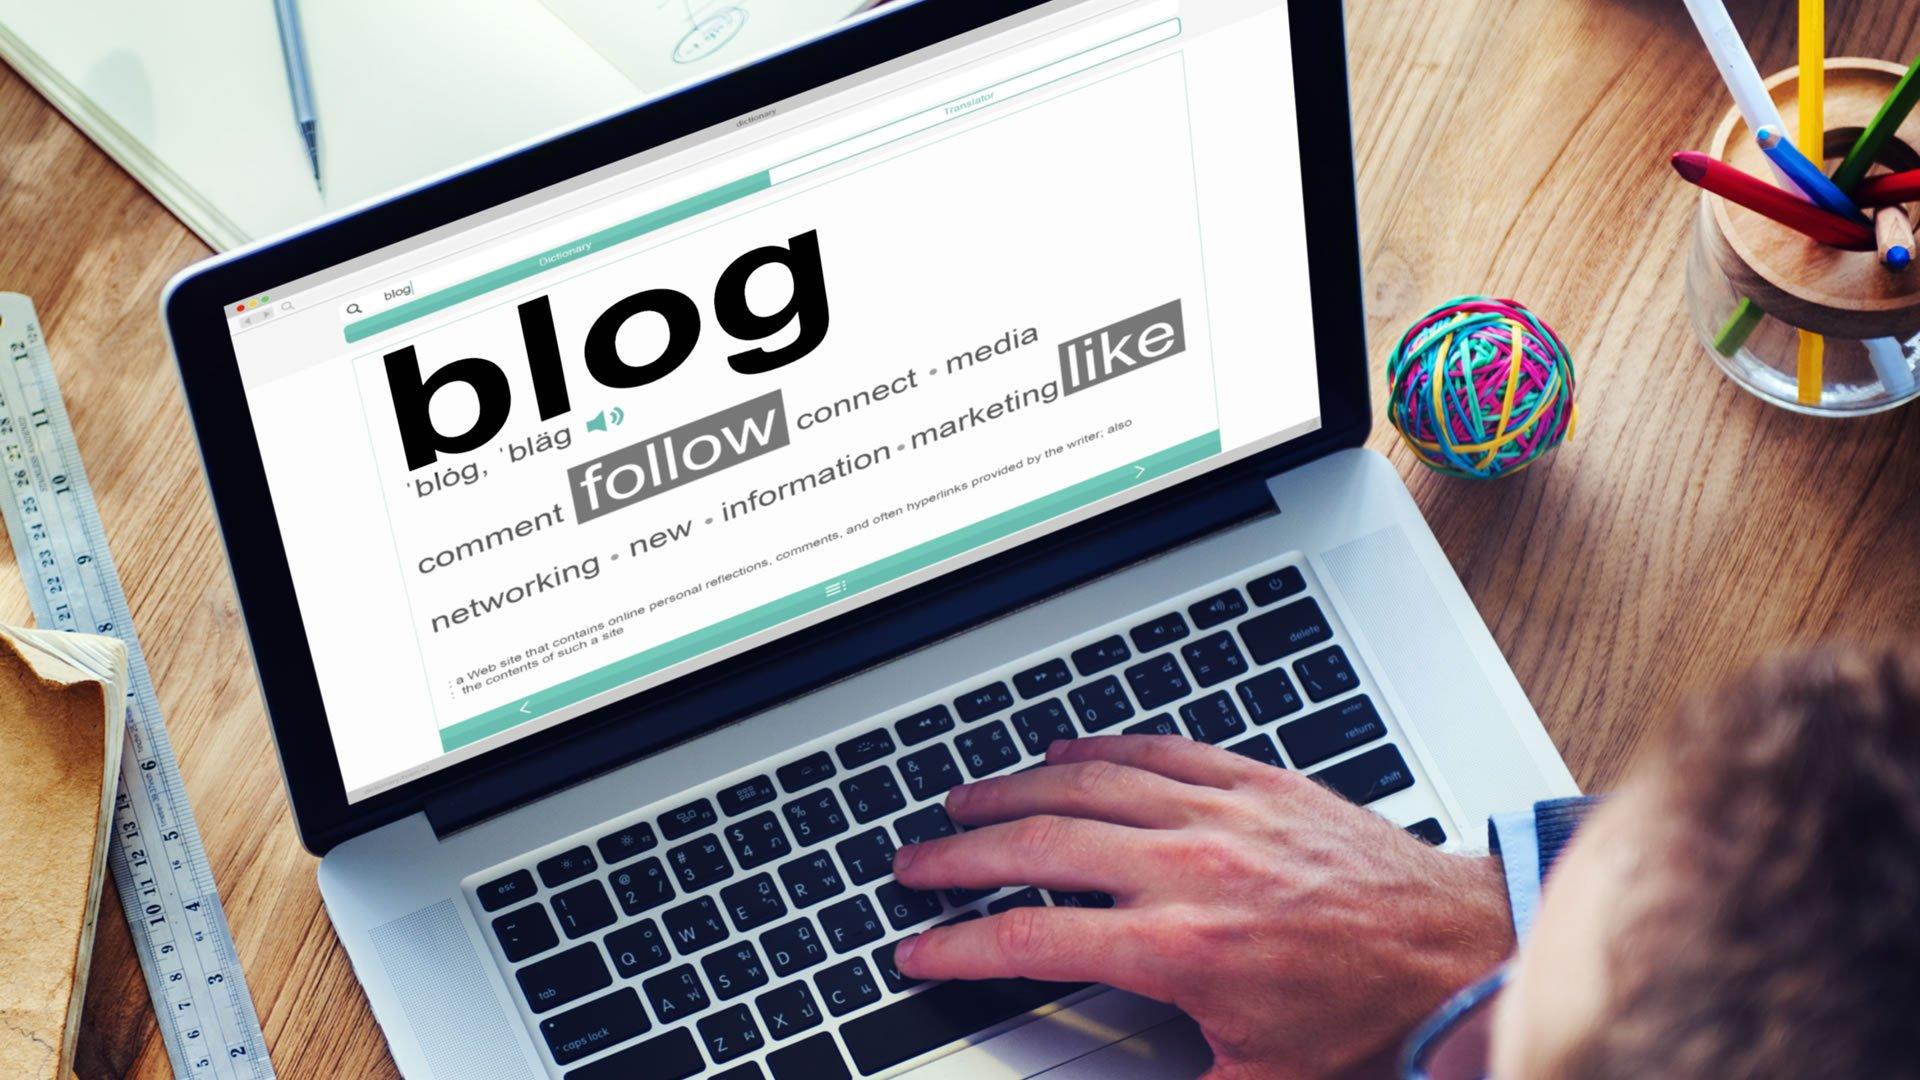 blog post inspiration for WordPress